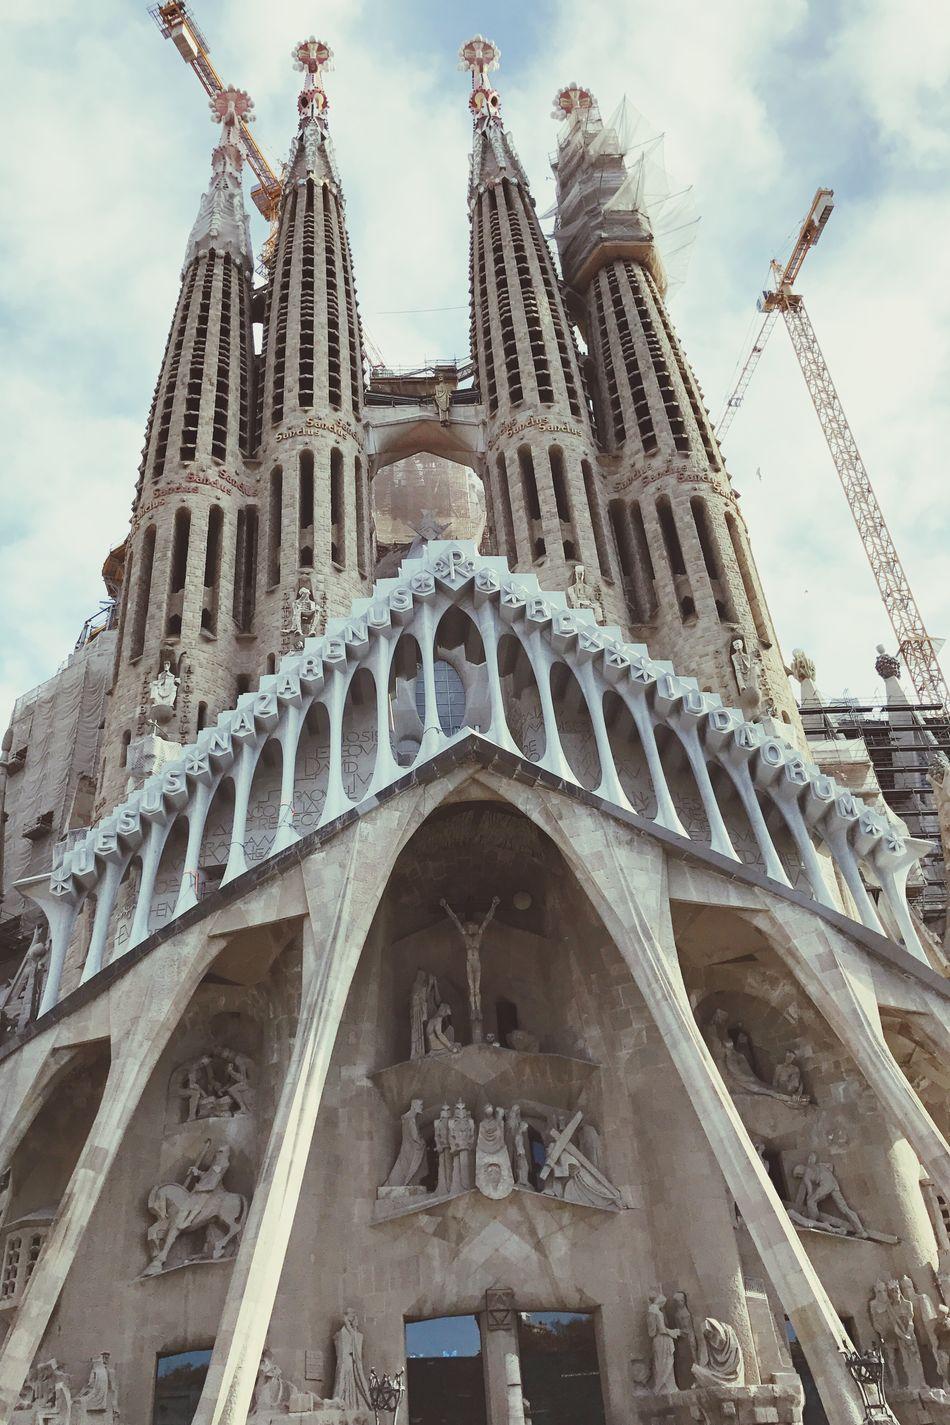 Sagradafamilia Gaudi Gaudì Architecture Work Built Structure Building Exterior City